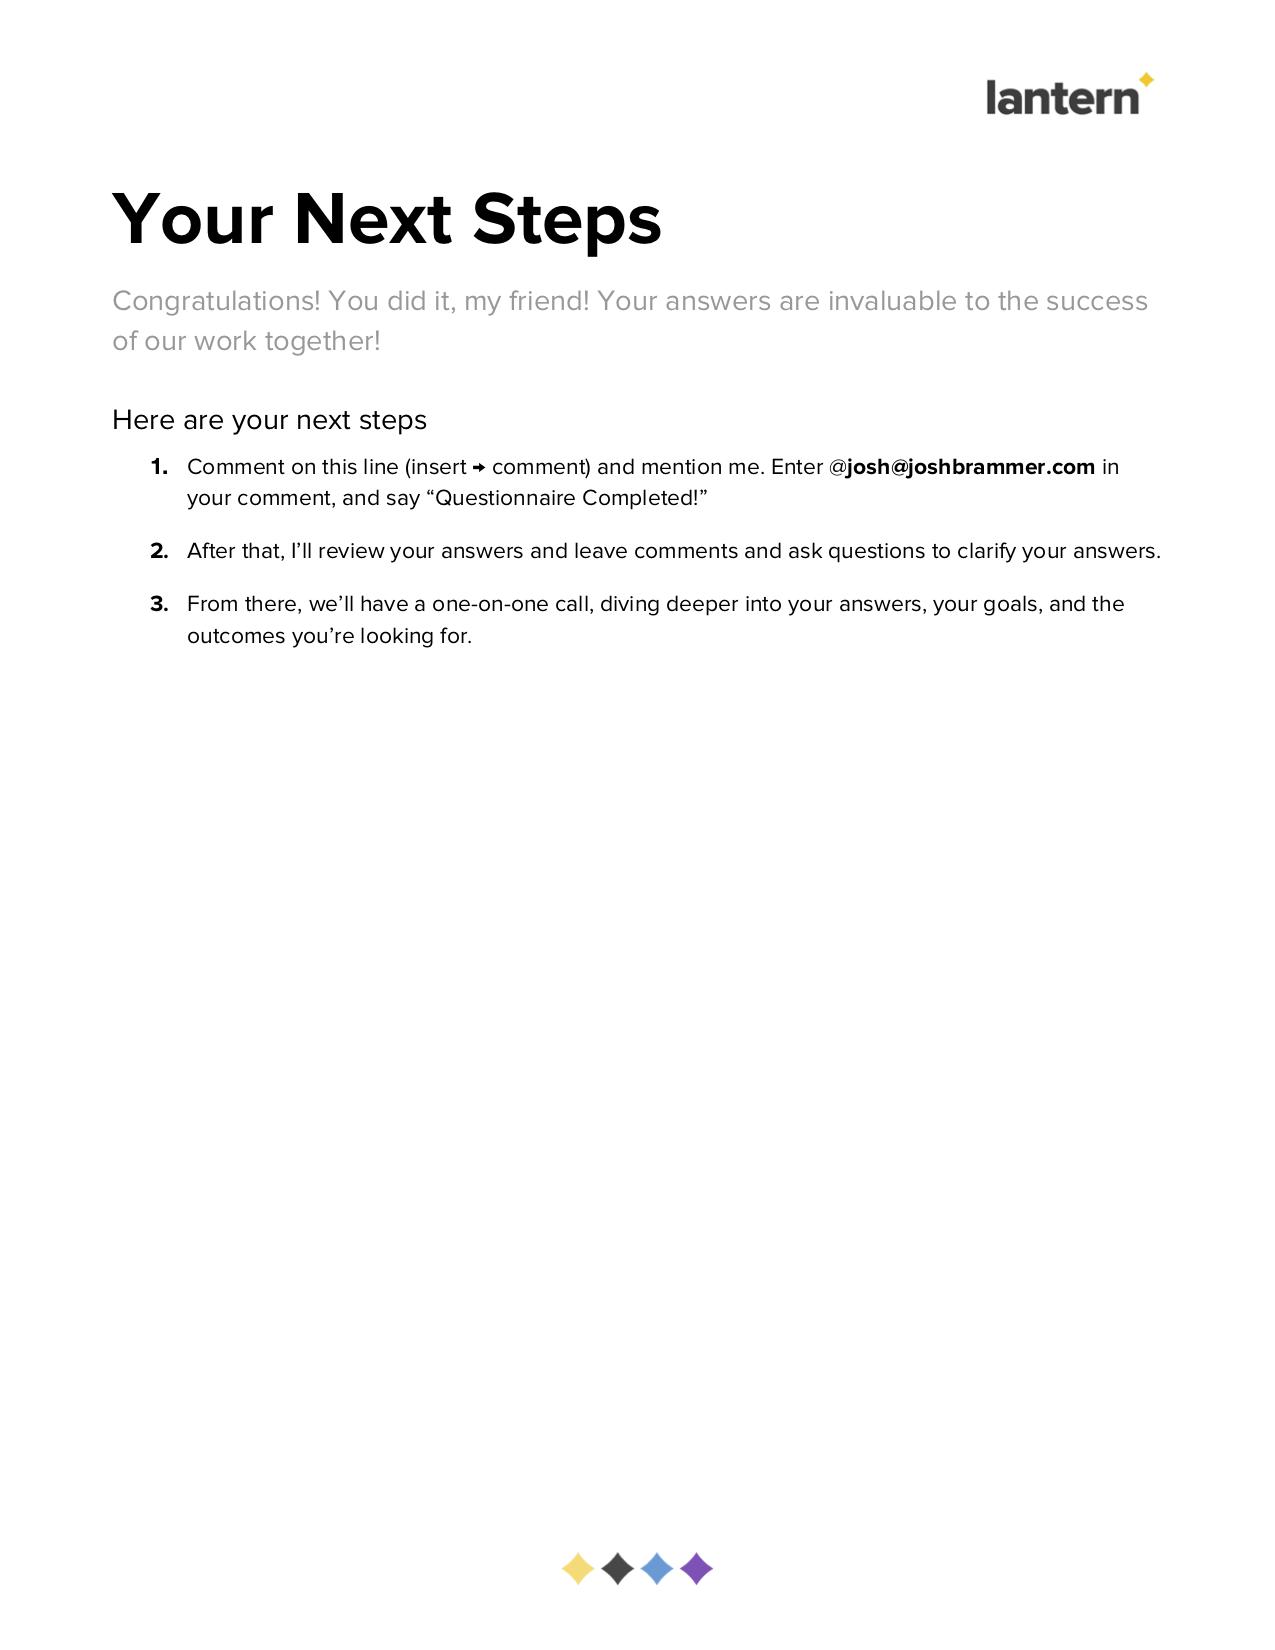 Marketing Roadmap Kickoff Questions_7.png